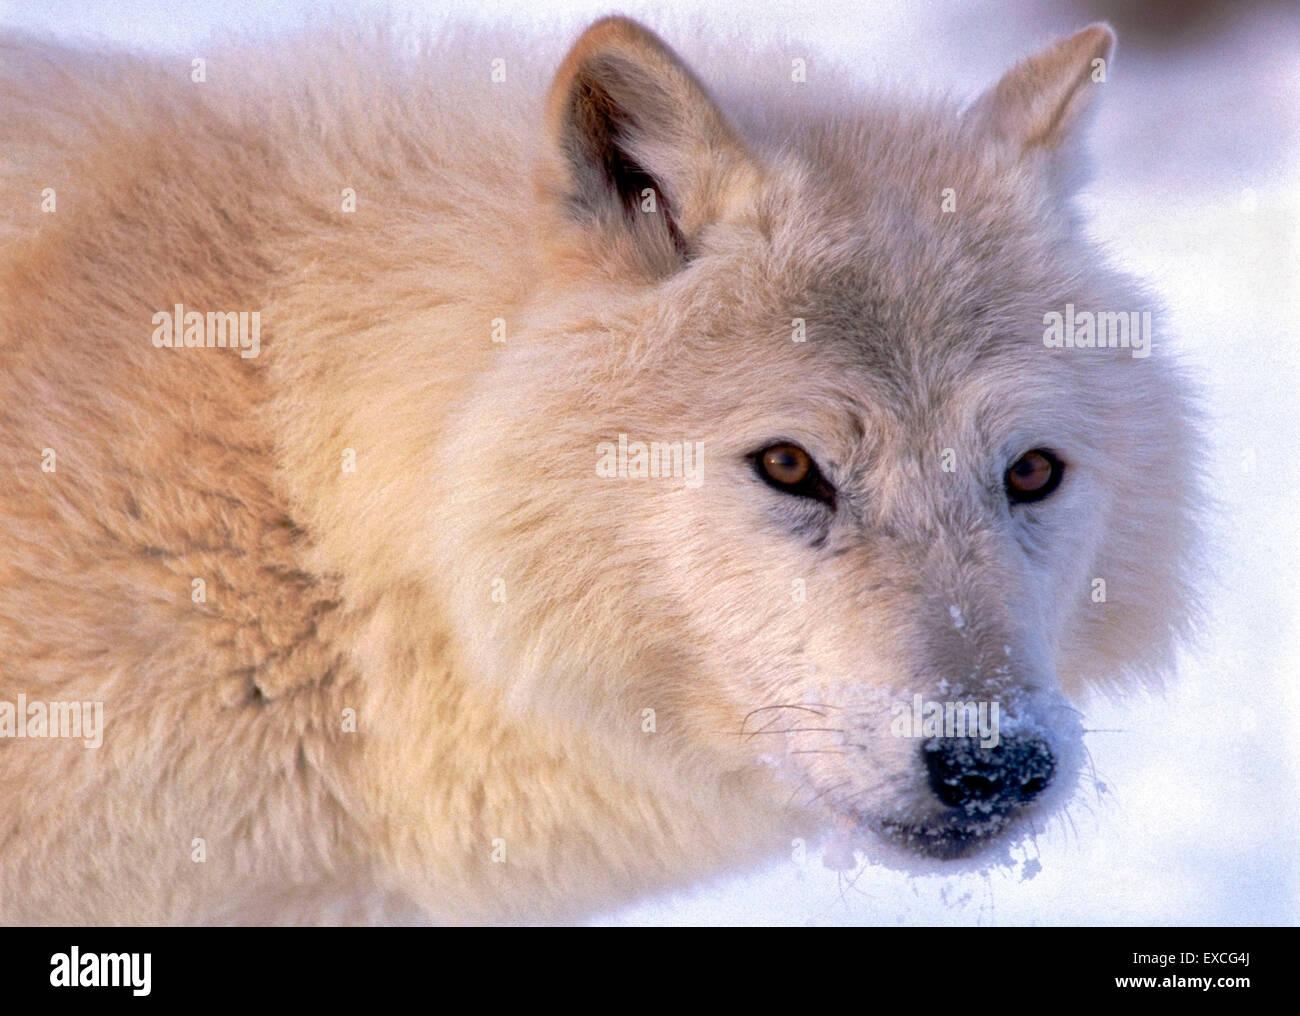 Arctic Wolf beobachten, Porträt, Nahaufnahme Stockbild